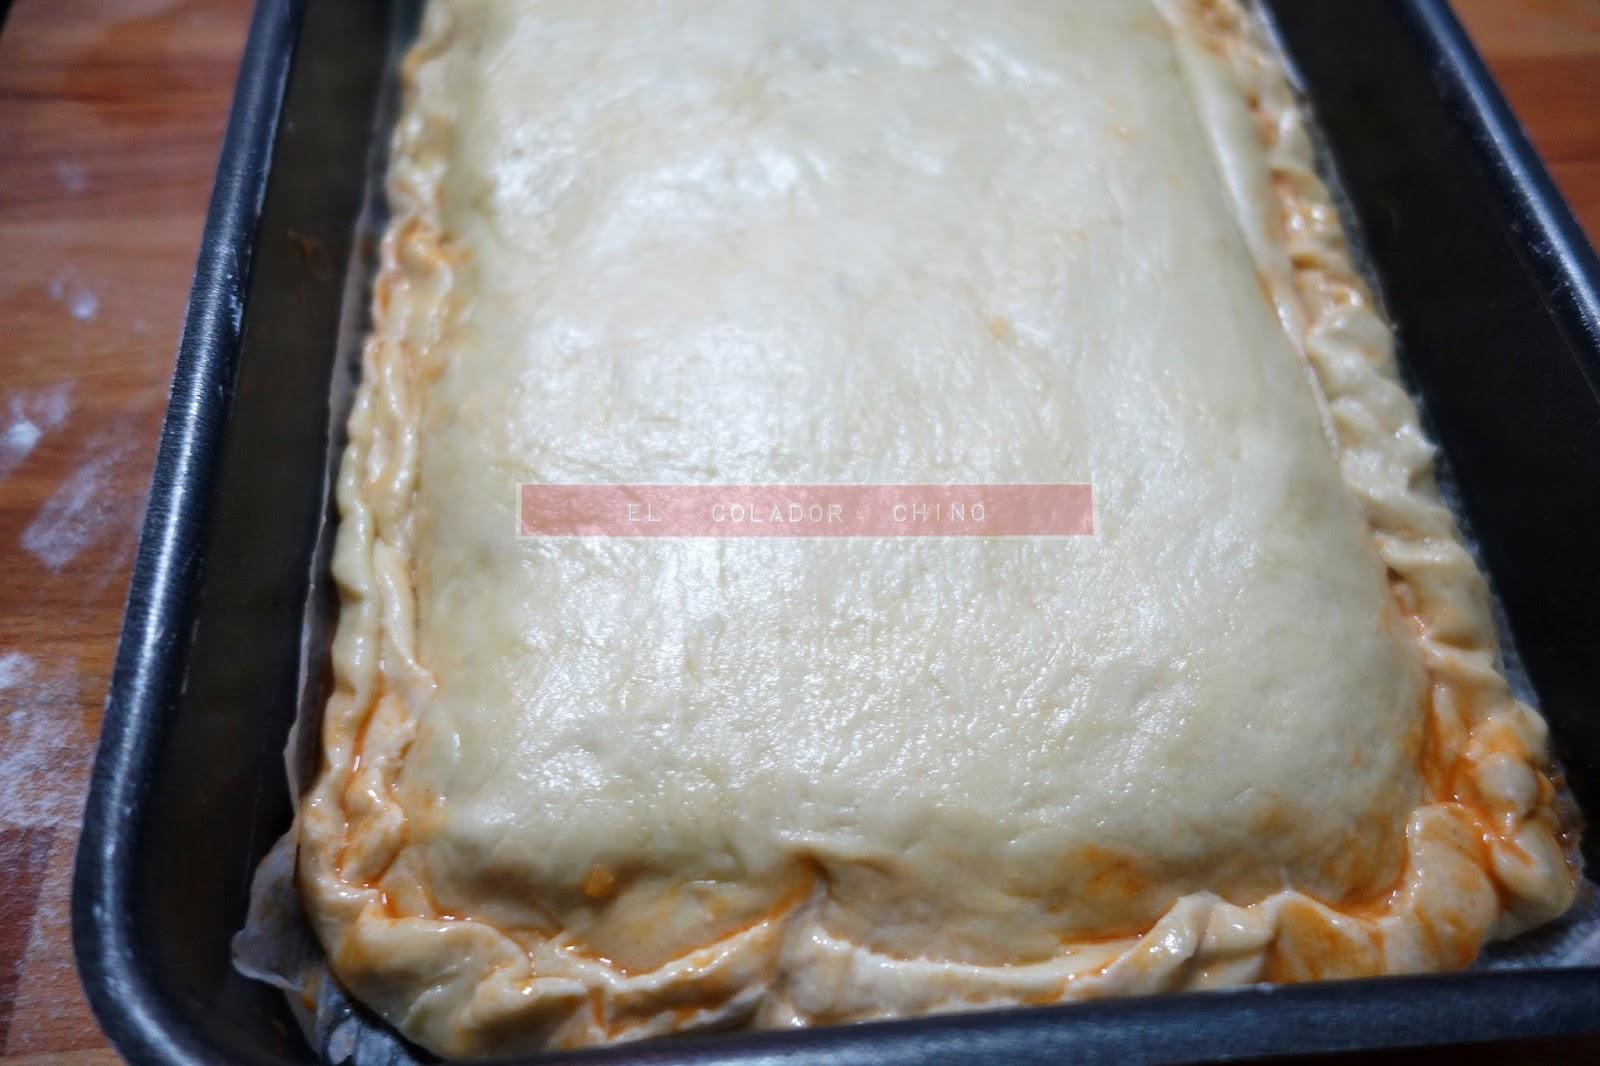 Receta de empanada gallega